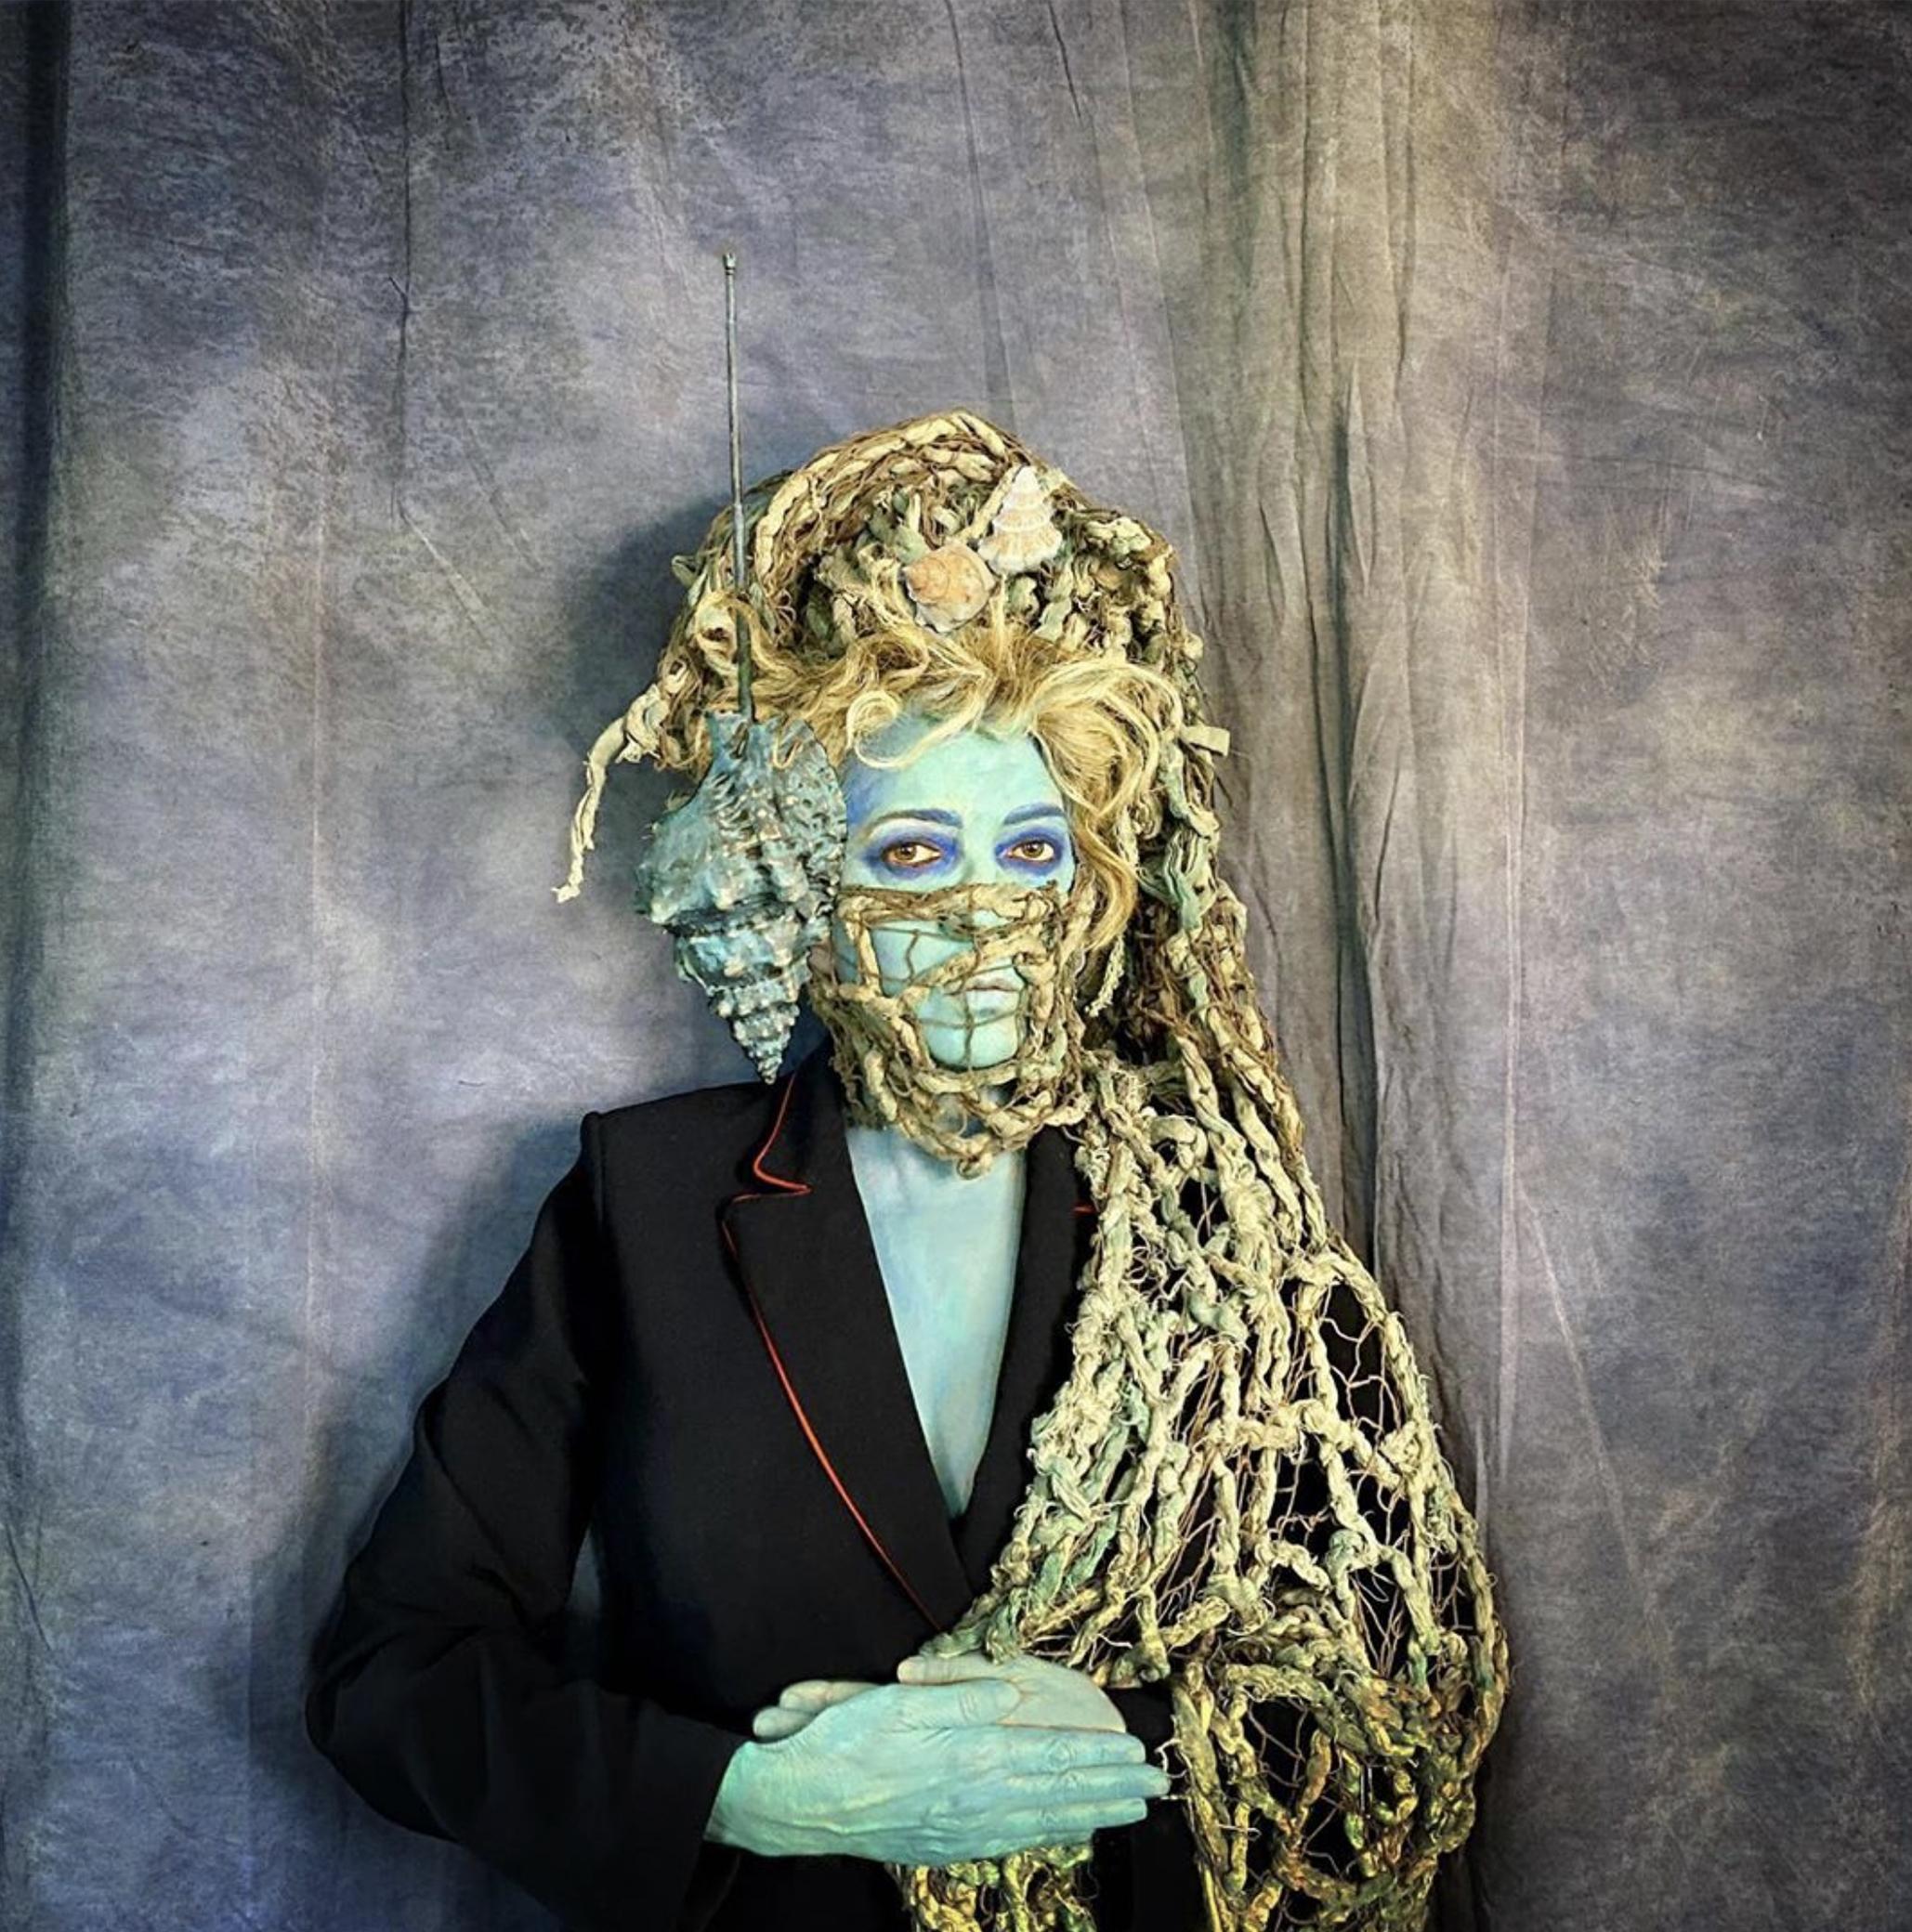 © Hélène Guétary (Paris, France) | Fisherman's mask